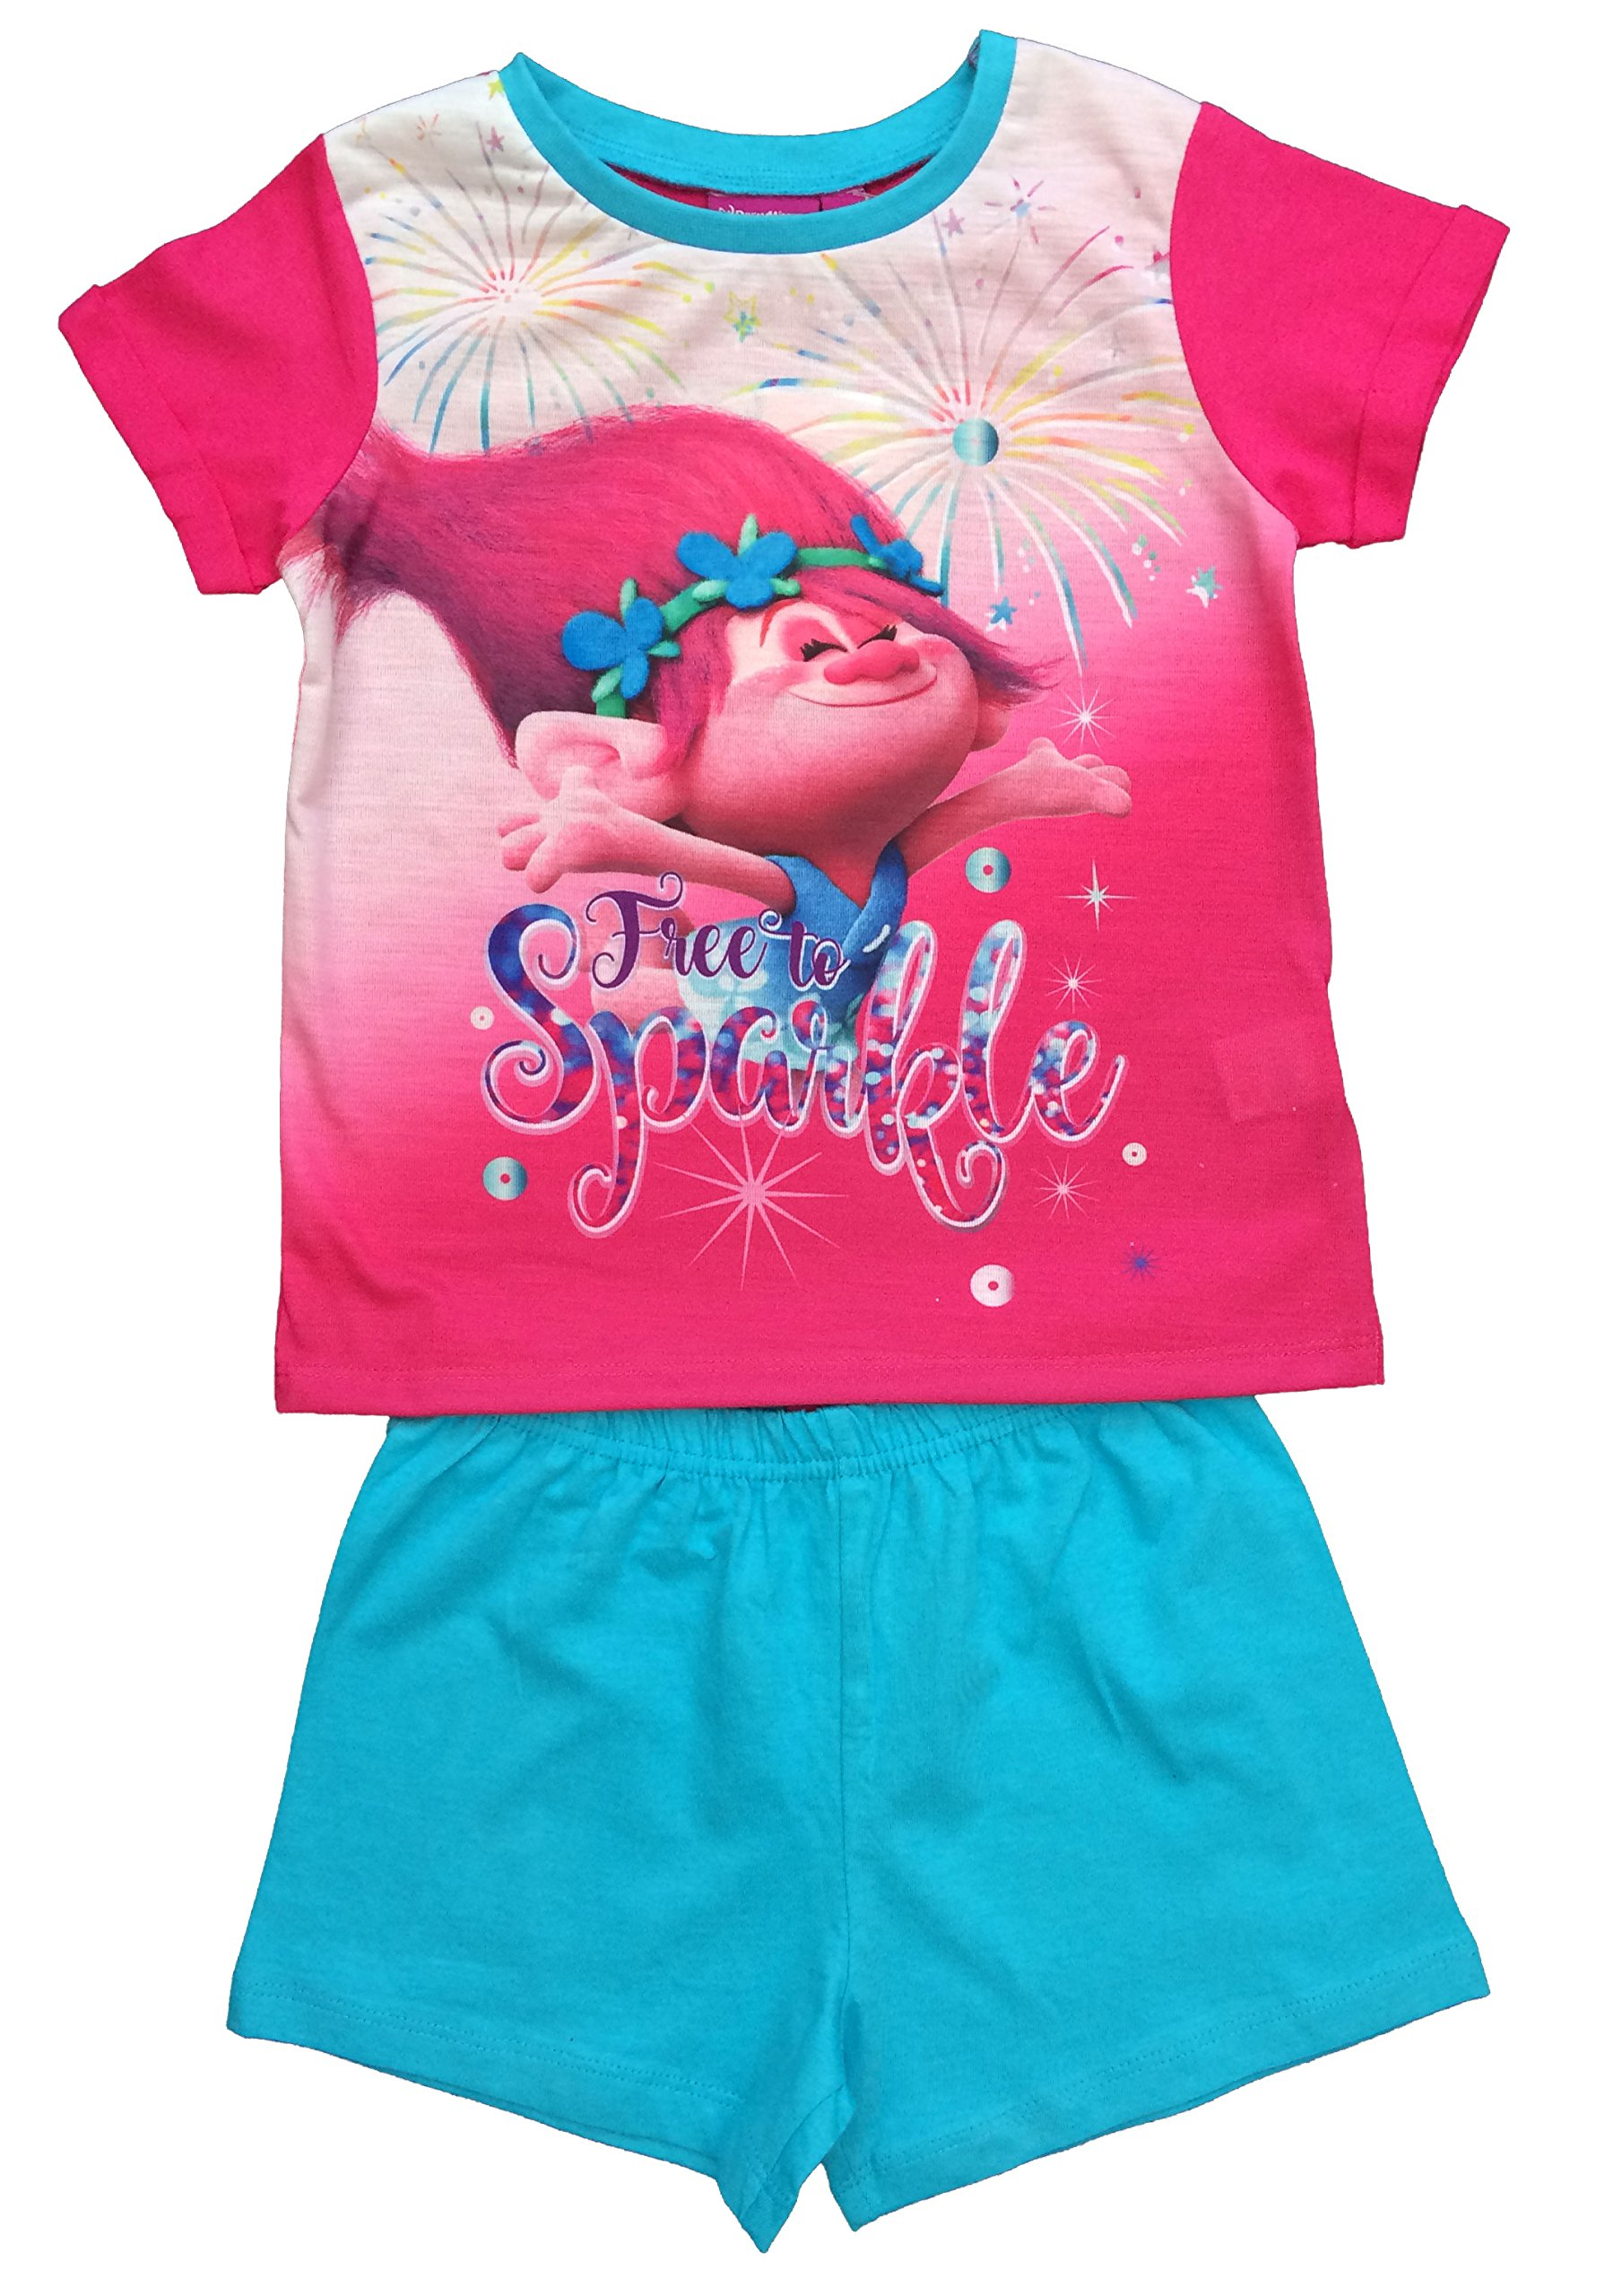 Dreamworks Trolls Girls pyjamas age 5-6 years trolls